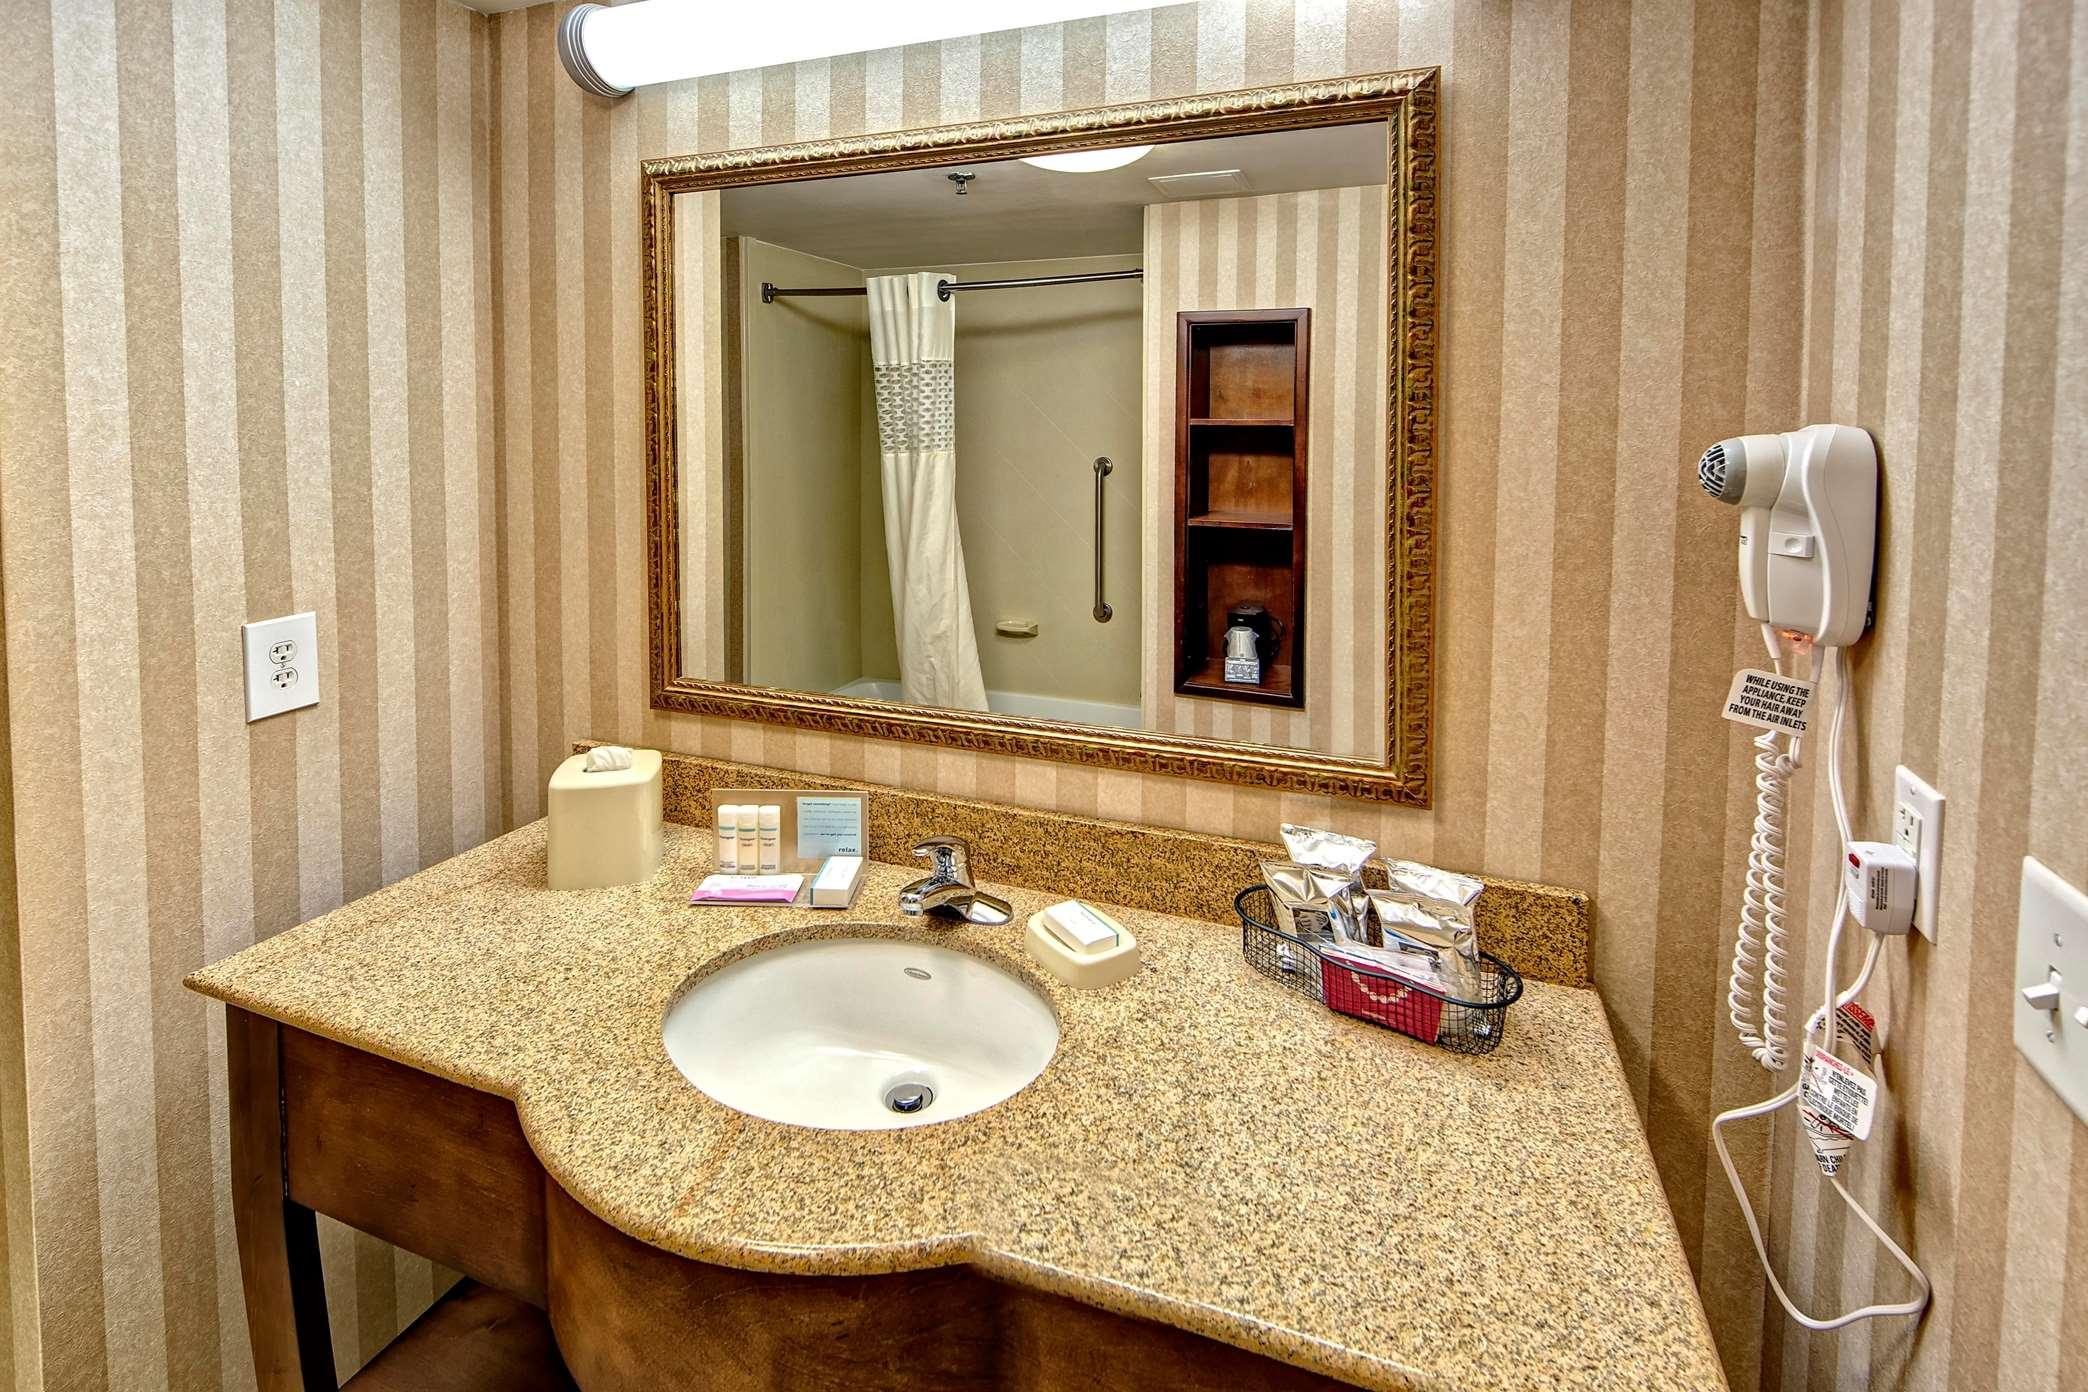 Hampton Inn & Suites Cashiers-Sapphire Valley image 22